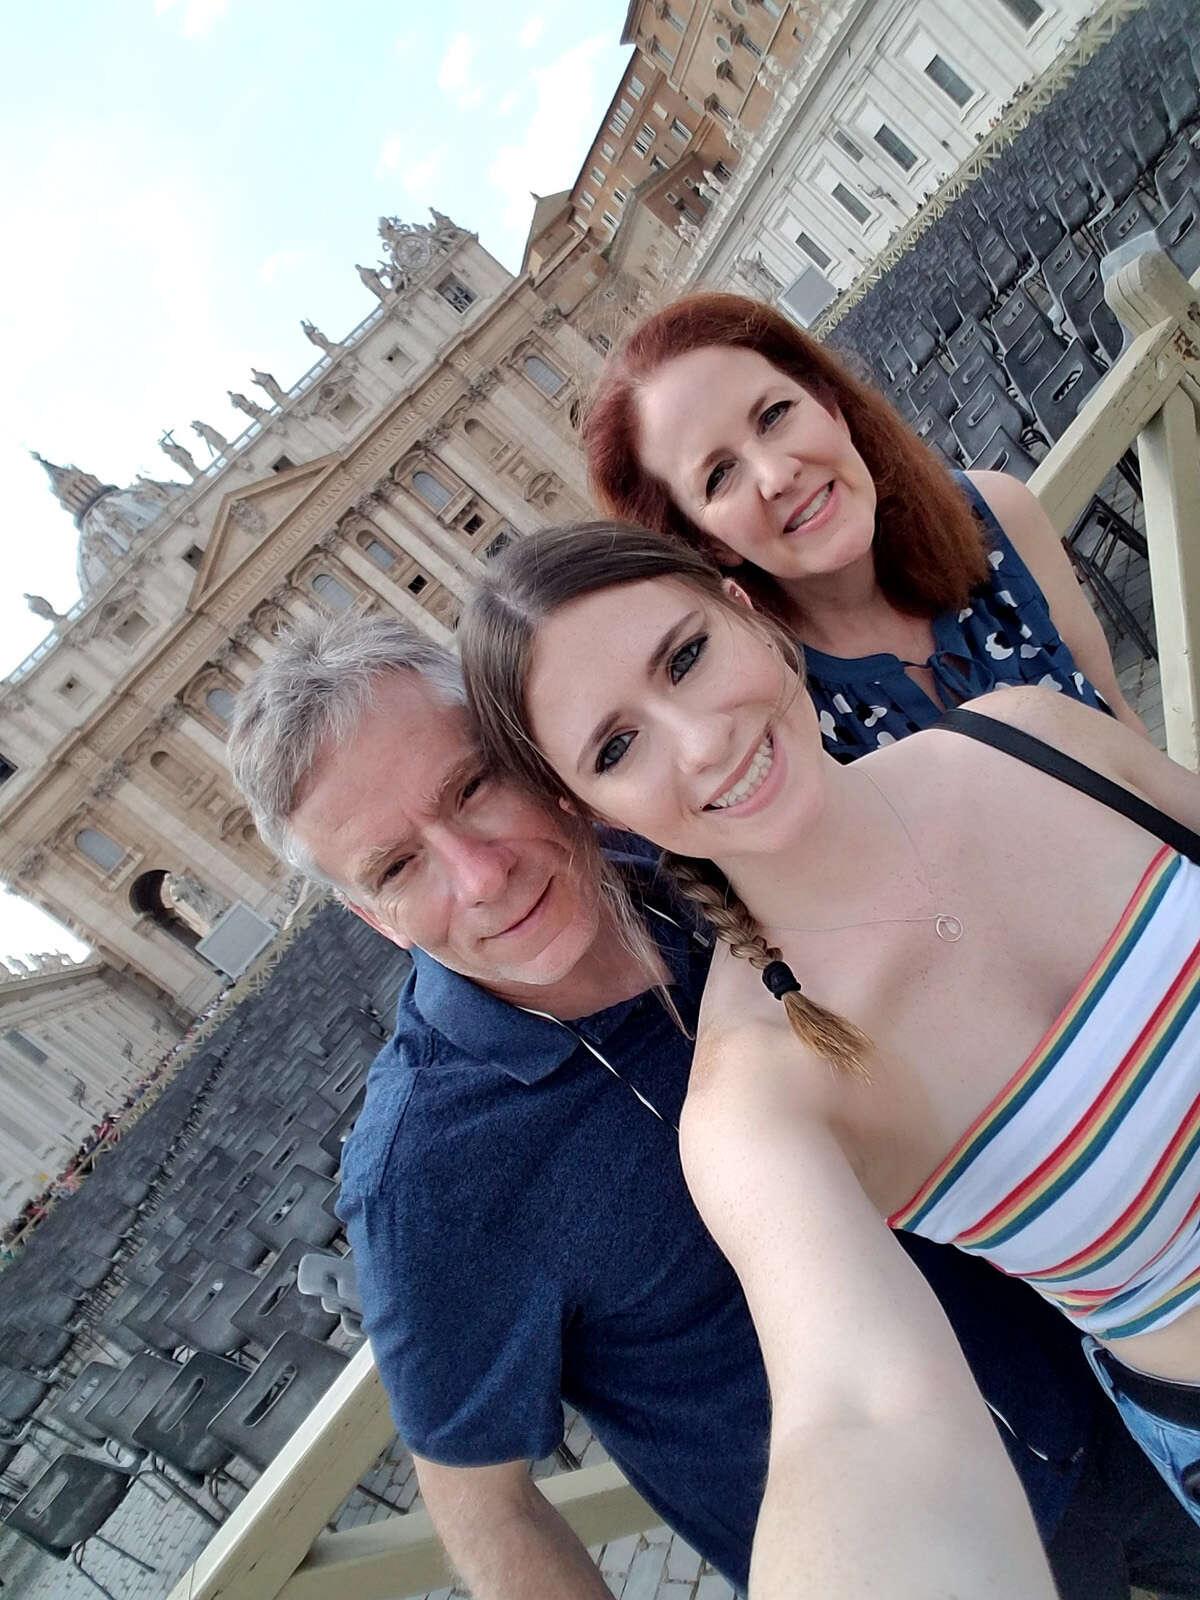 The Shenfelds outside of St. Peter's Basilica in Vatican City. (Samantha Shenfeld/Chicago Tribune/TNS)